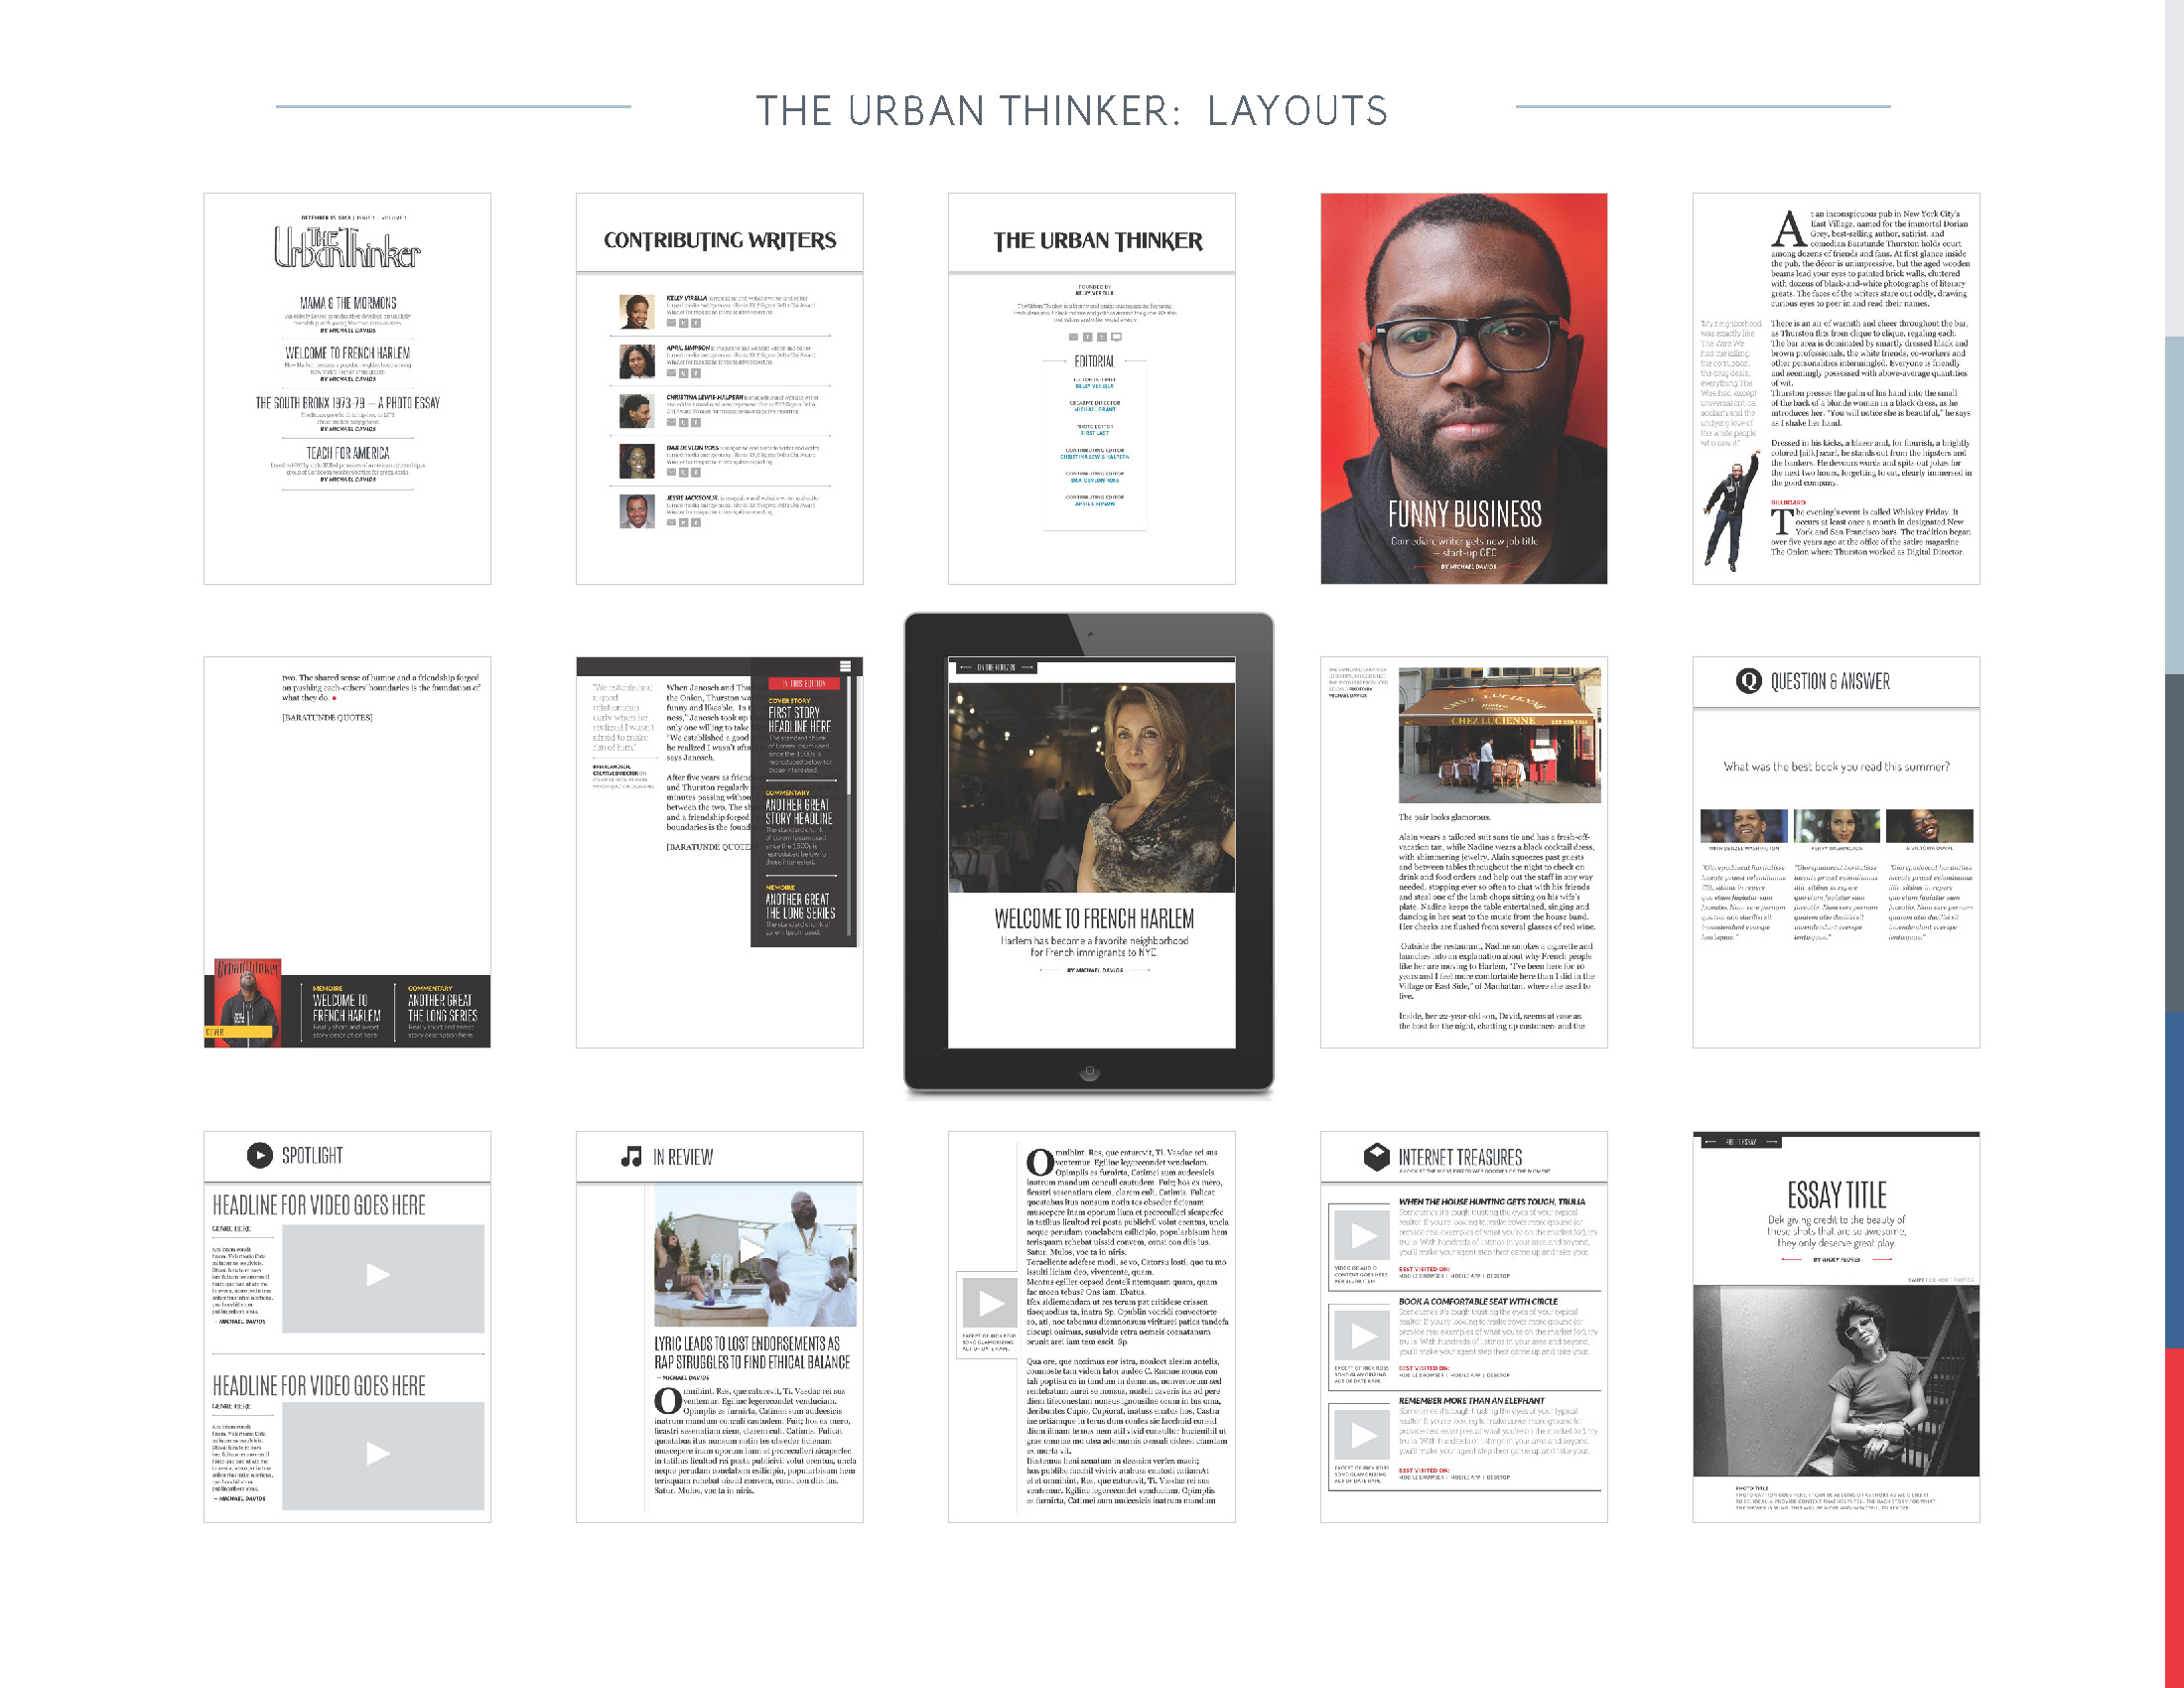 Michael-Grant-Portfolio-Latest-2014XXX_Page_16